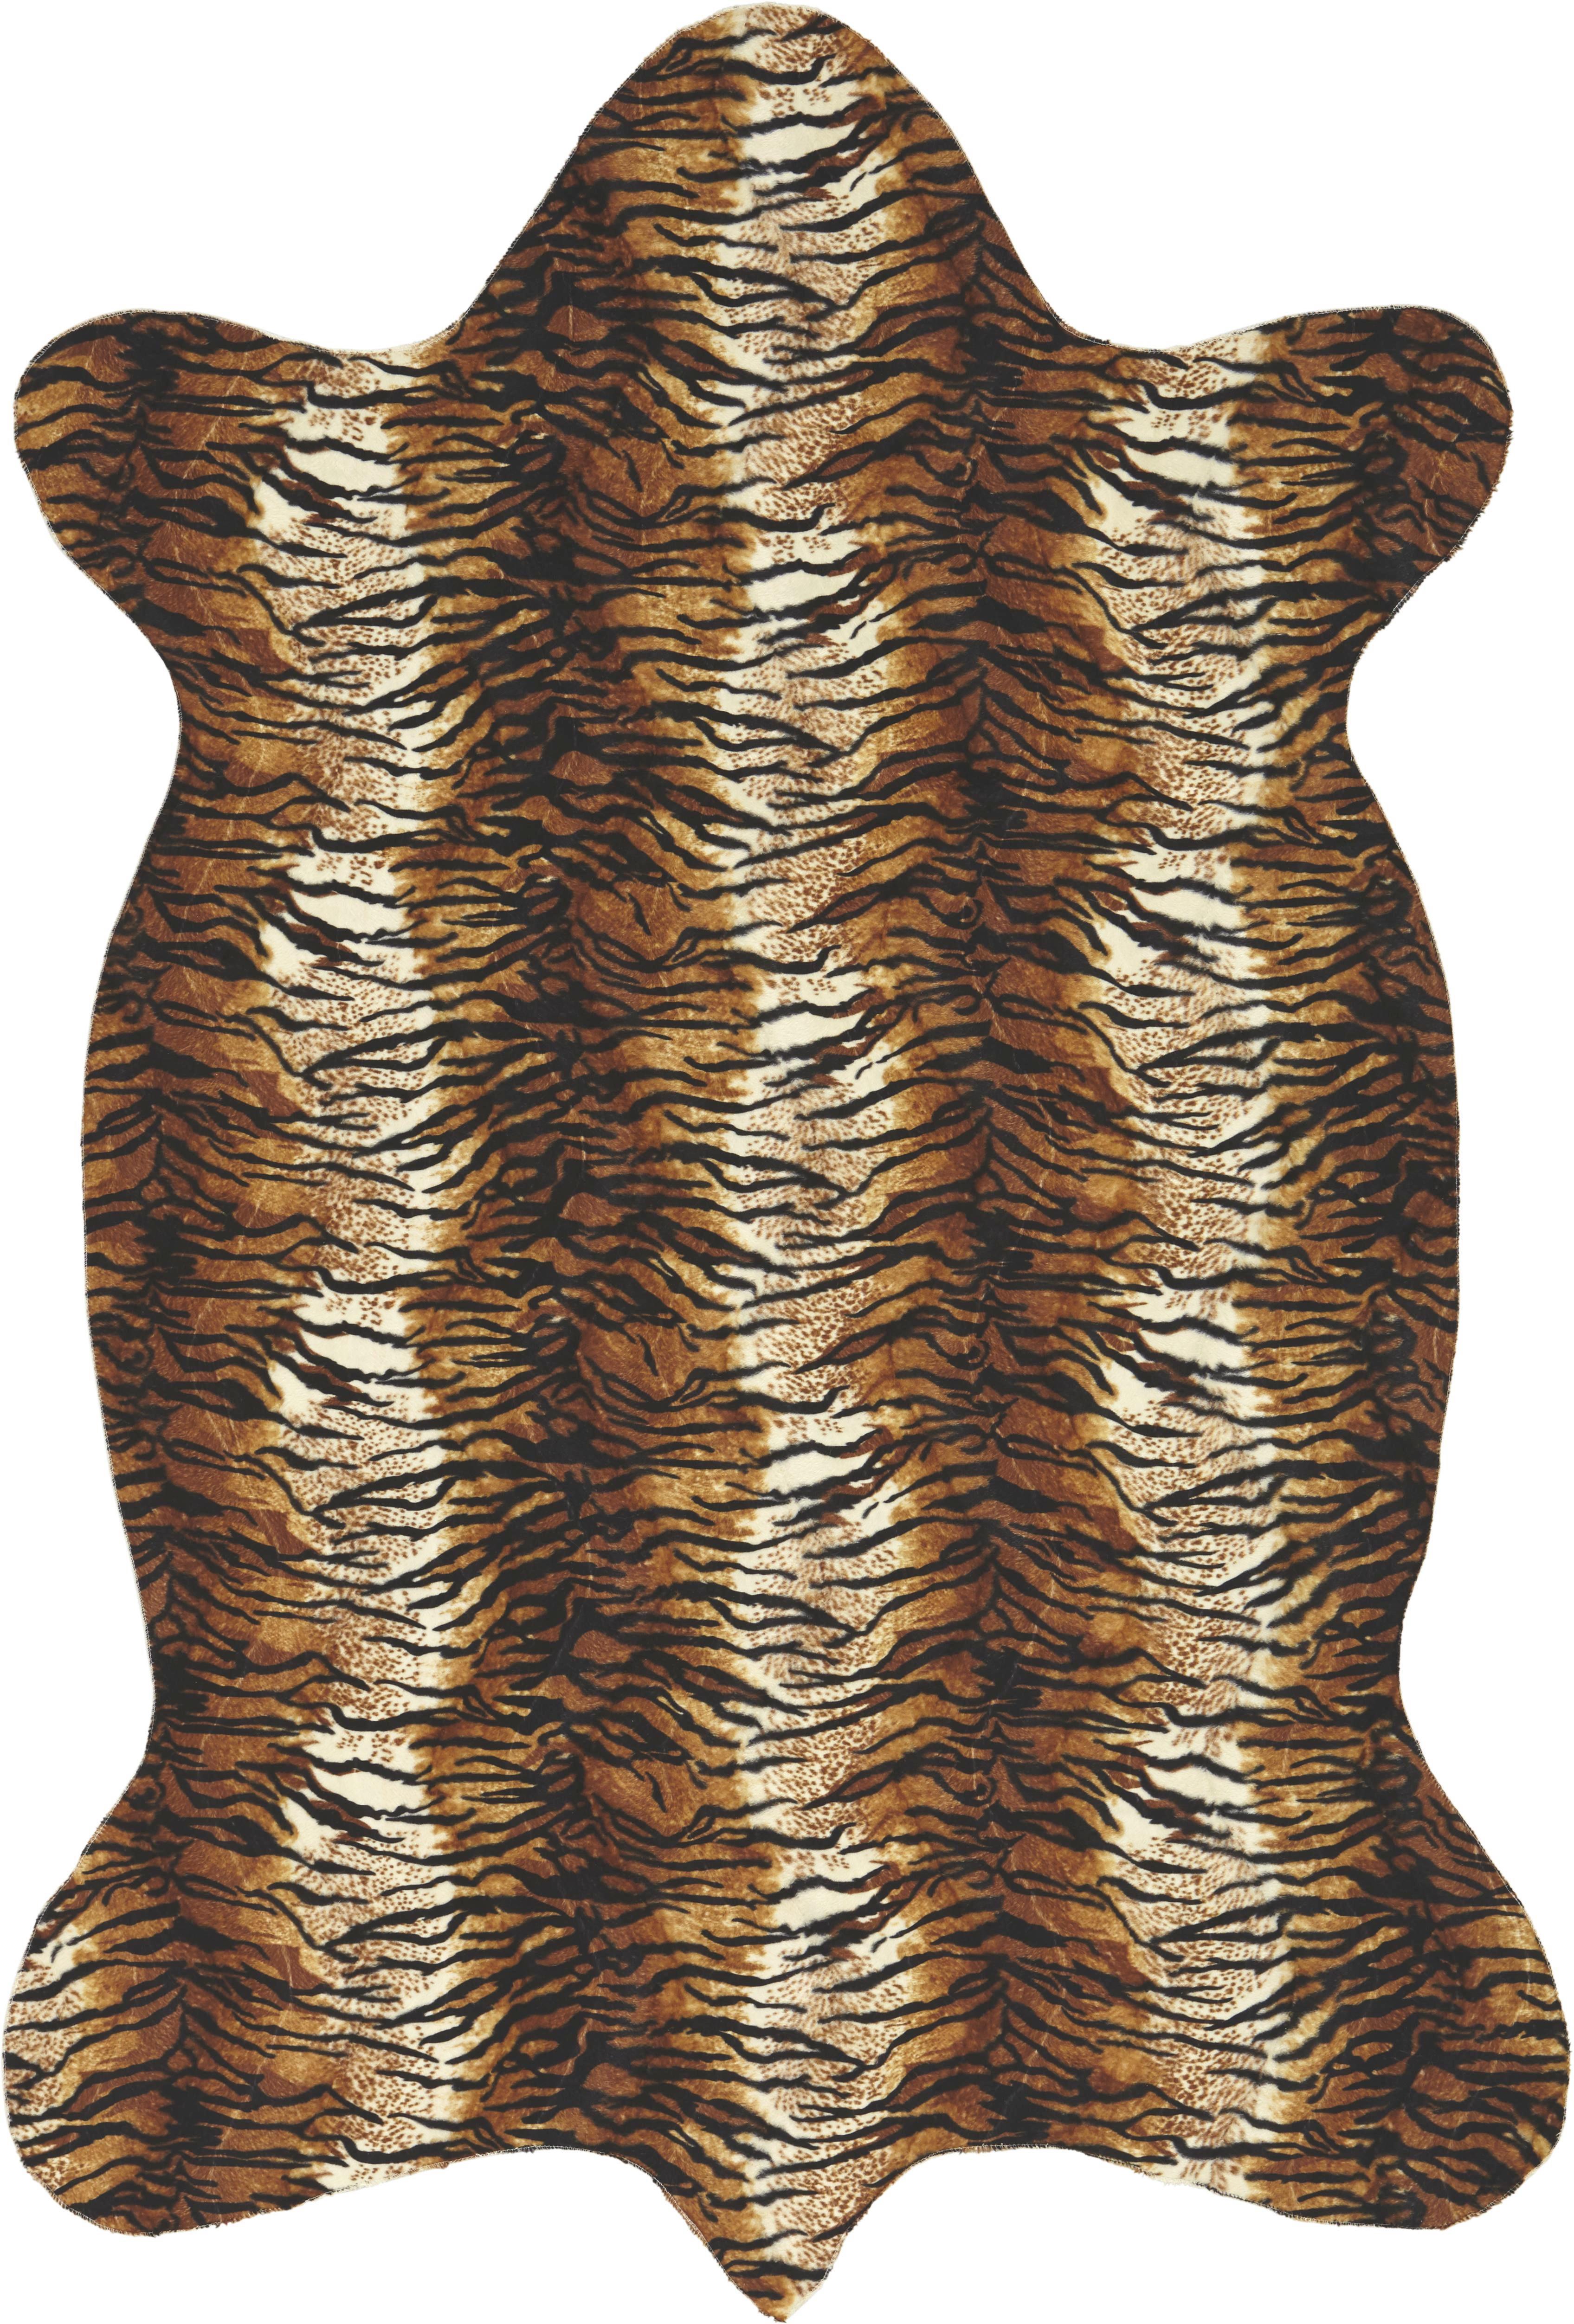 Szőnyeg Animal Tiger - barna/fehér, Lifestyle, textil (120/180cm) - MÖMAX modern living